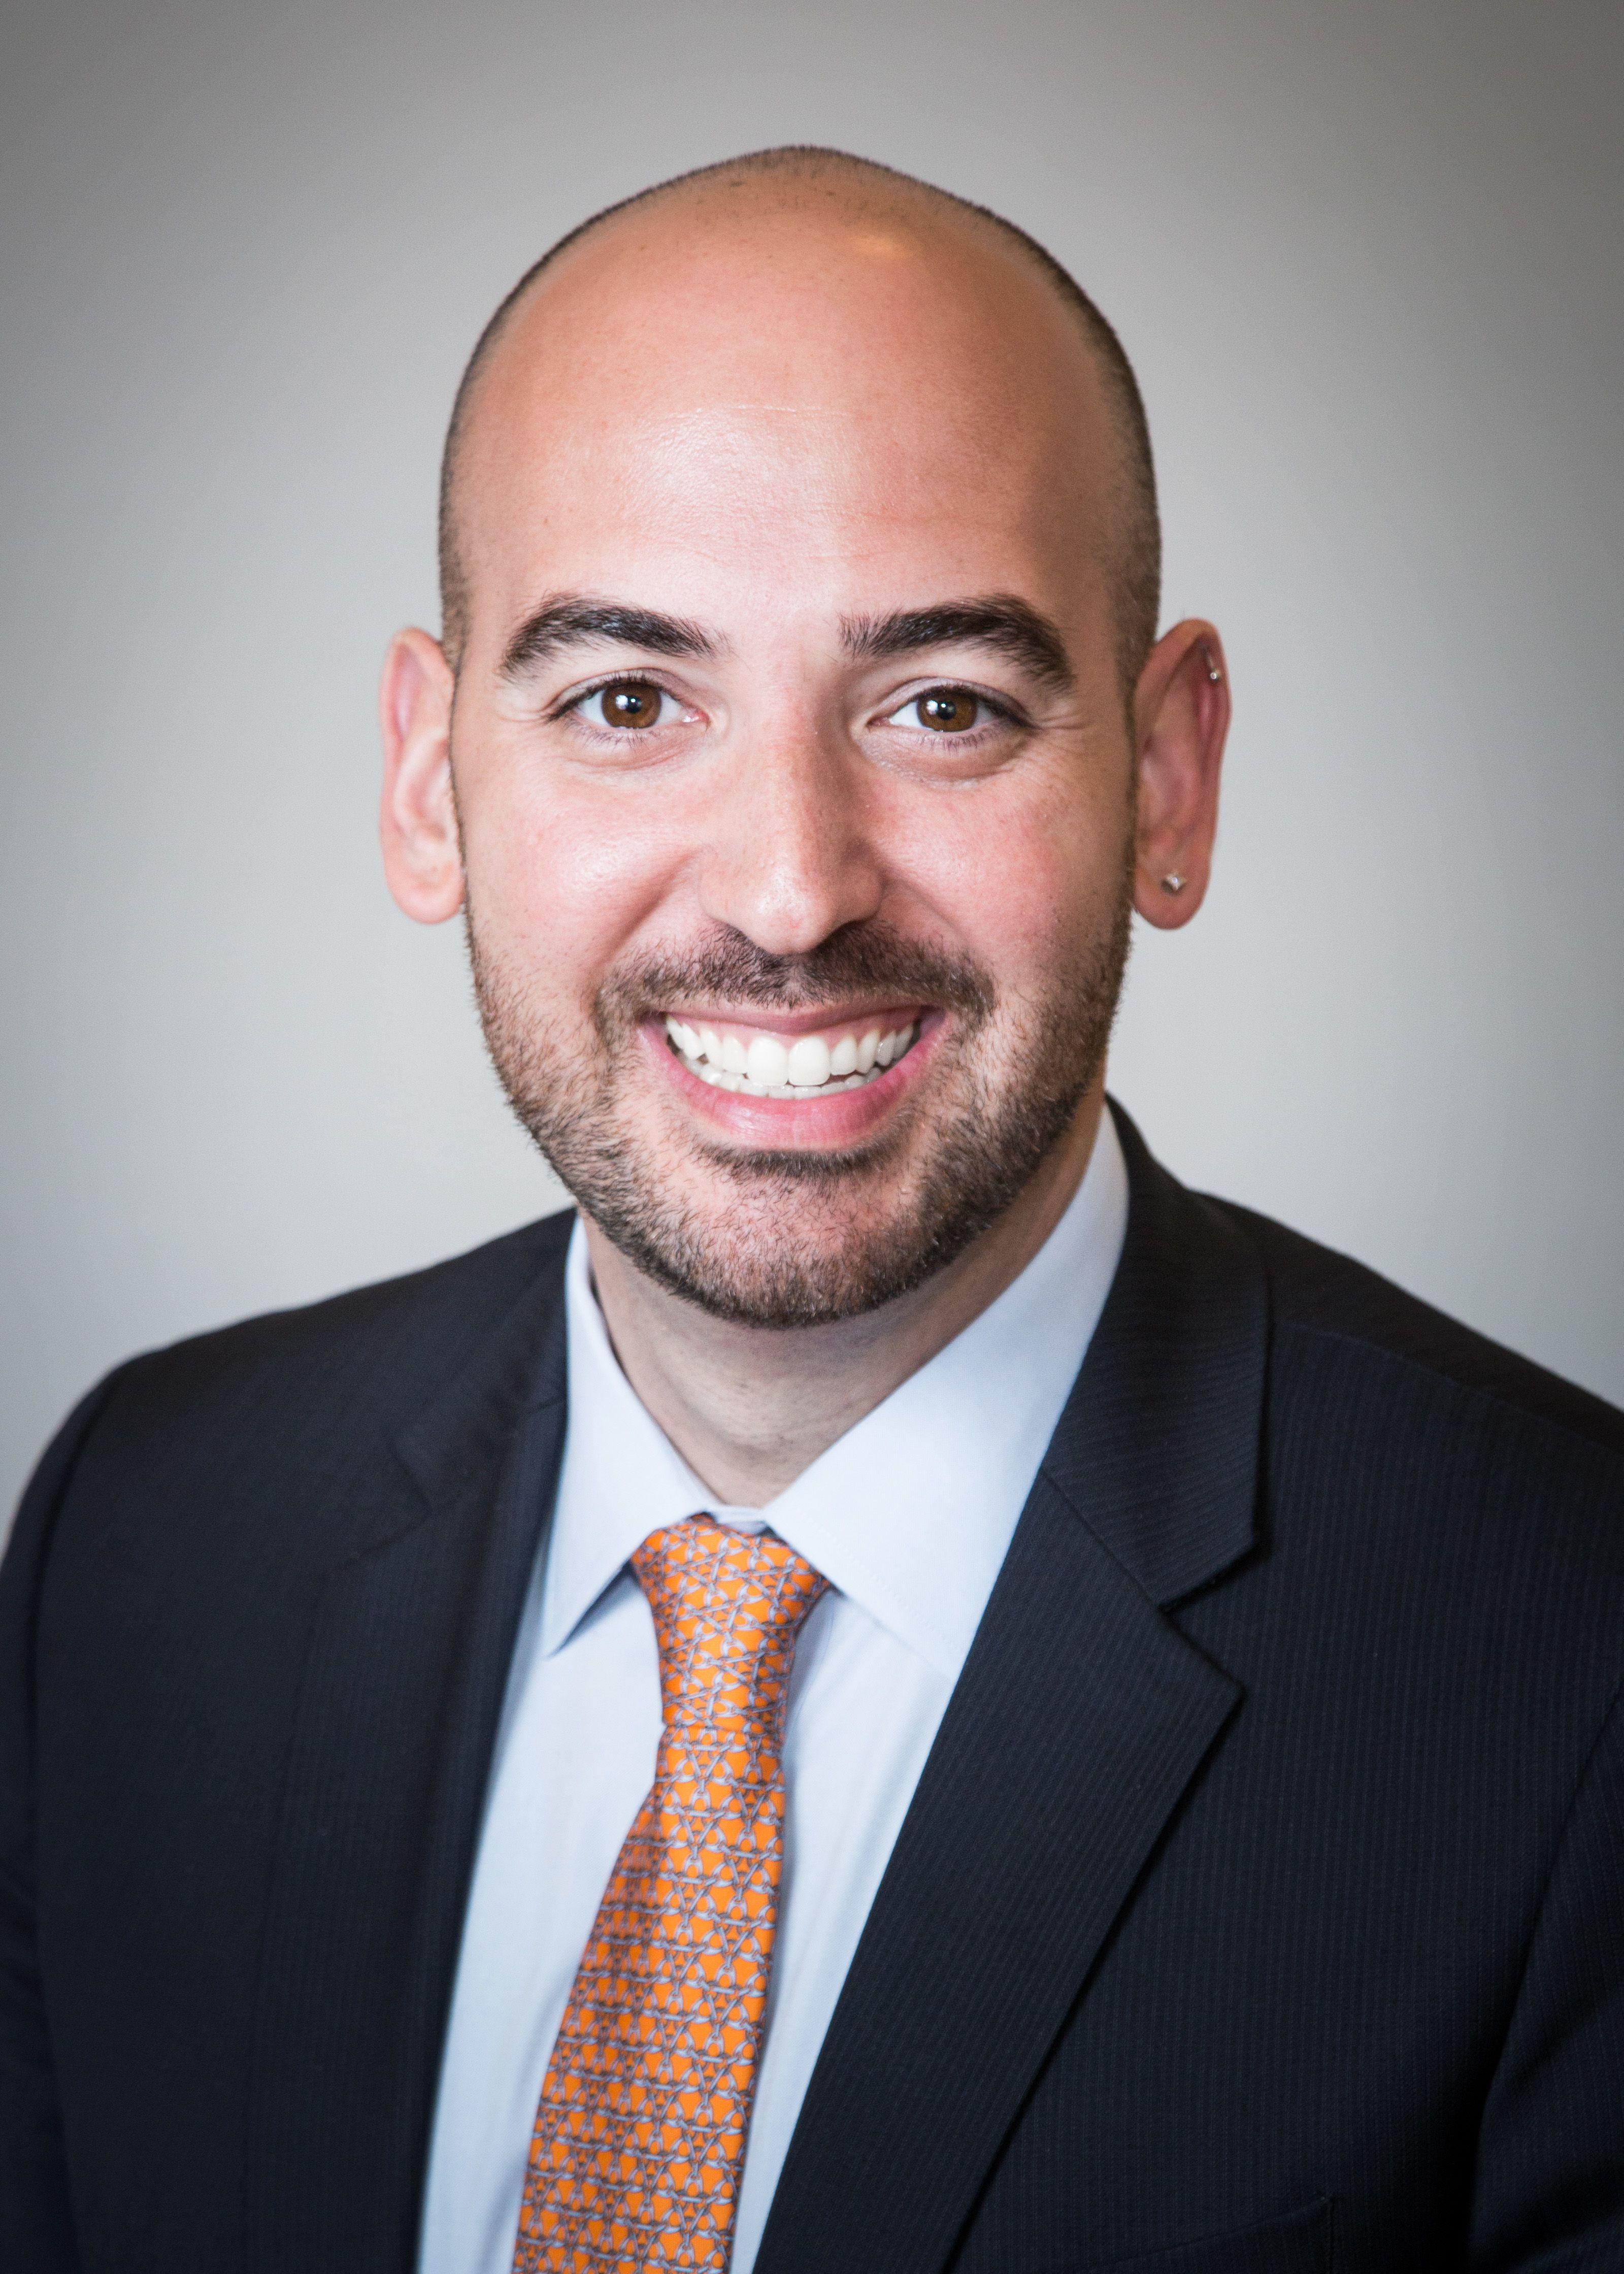 Headshot of Joseph Leggio